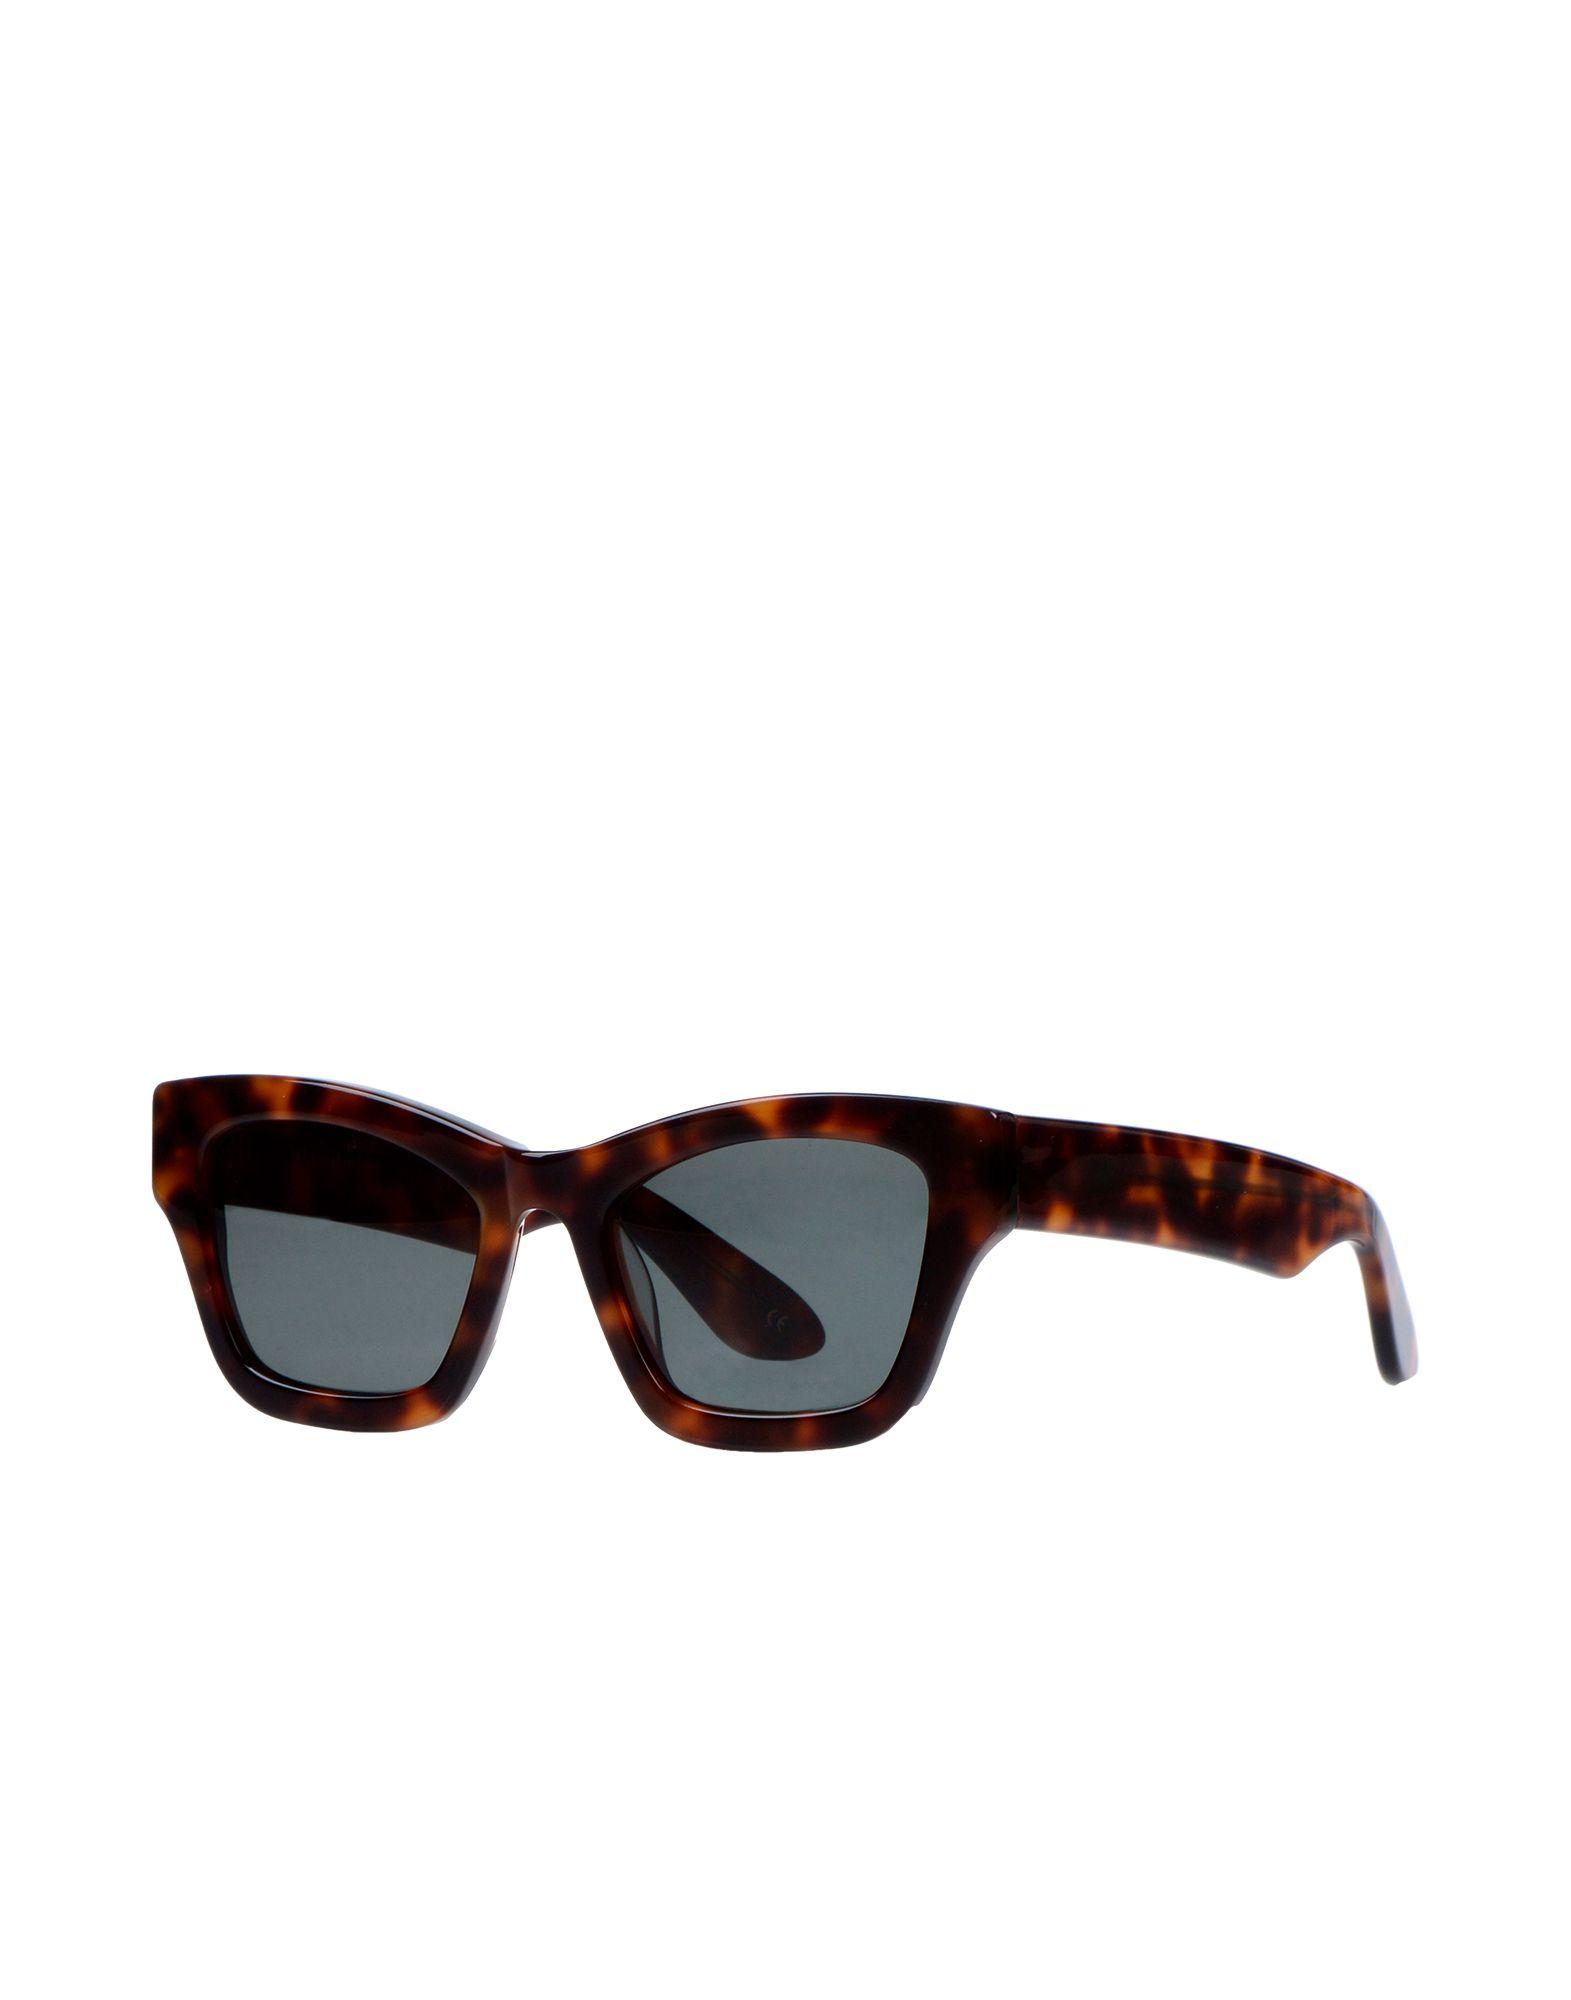 HAN KJØBENHAVN Sunglasses - Item 46644482